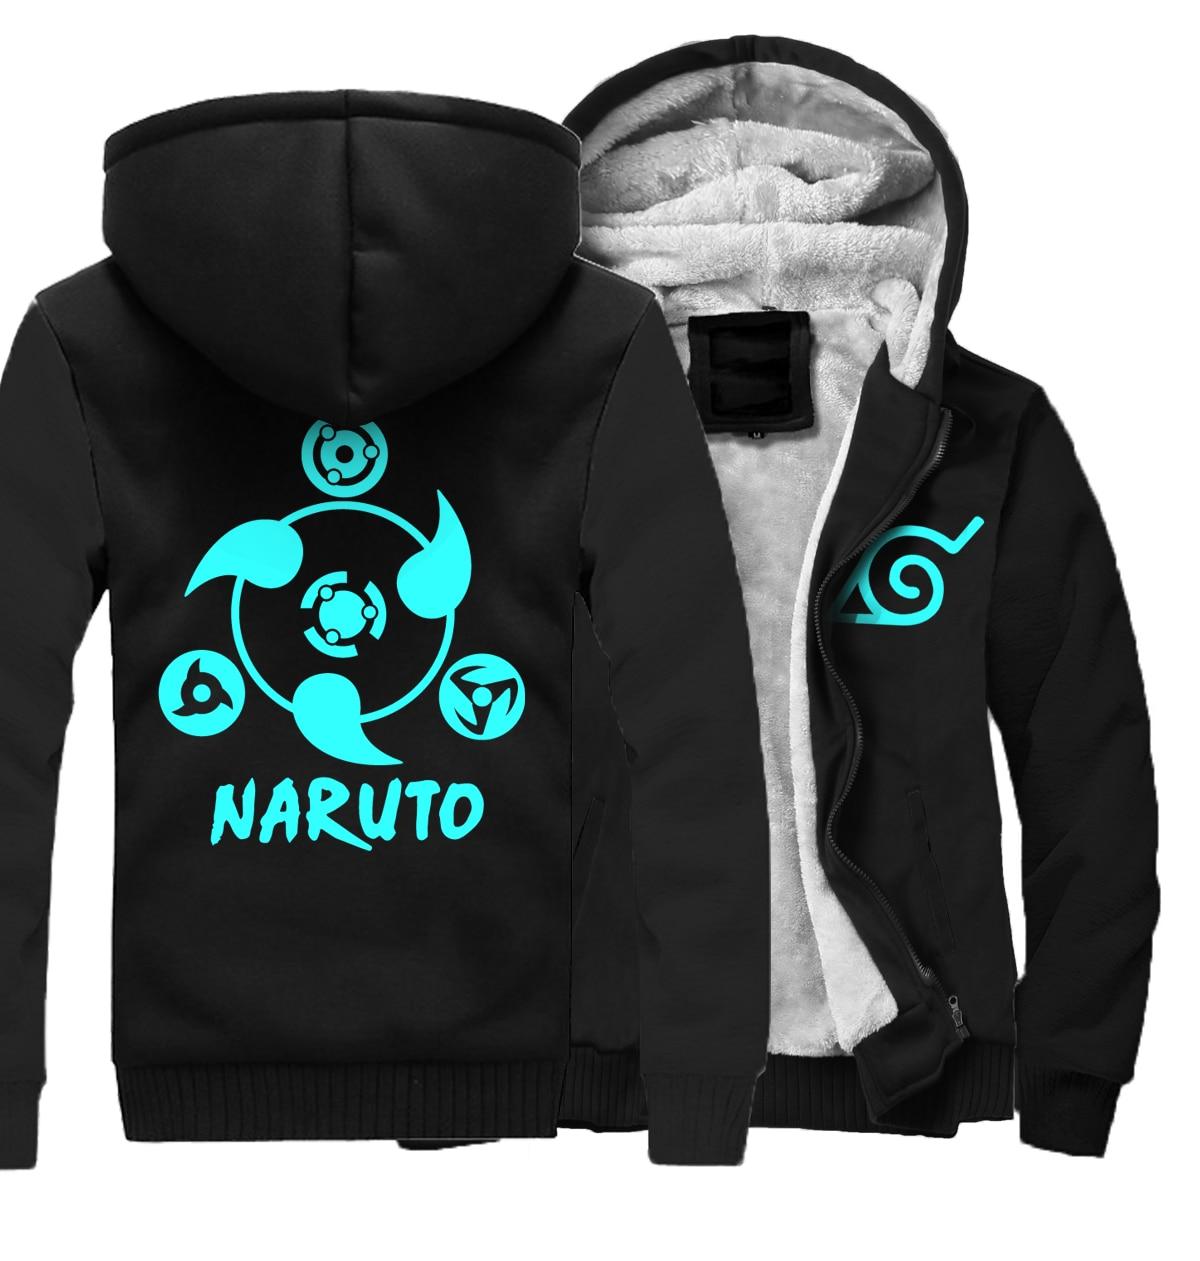 Hoodies noctilucous 2019 top tracksuits Naruto Thick Zipper cartoon Jacket fashion Men wool liner Sweatshirts Camouflage sleeve